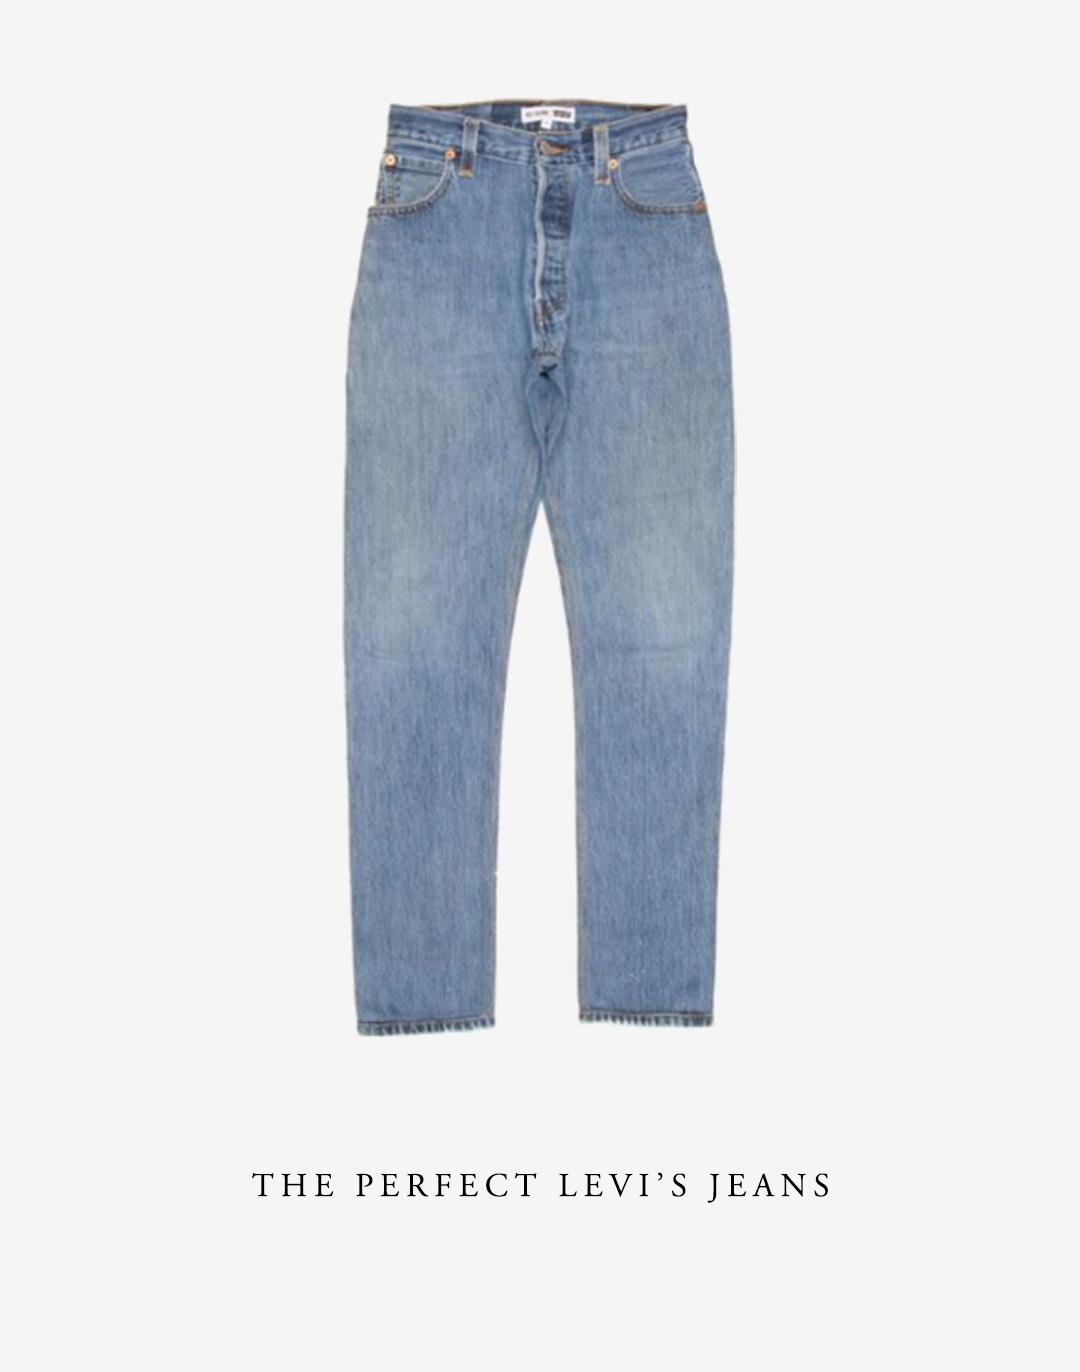 levis jeans.jpg